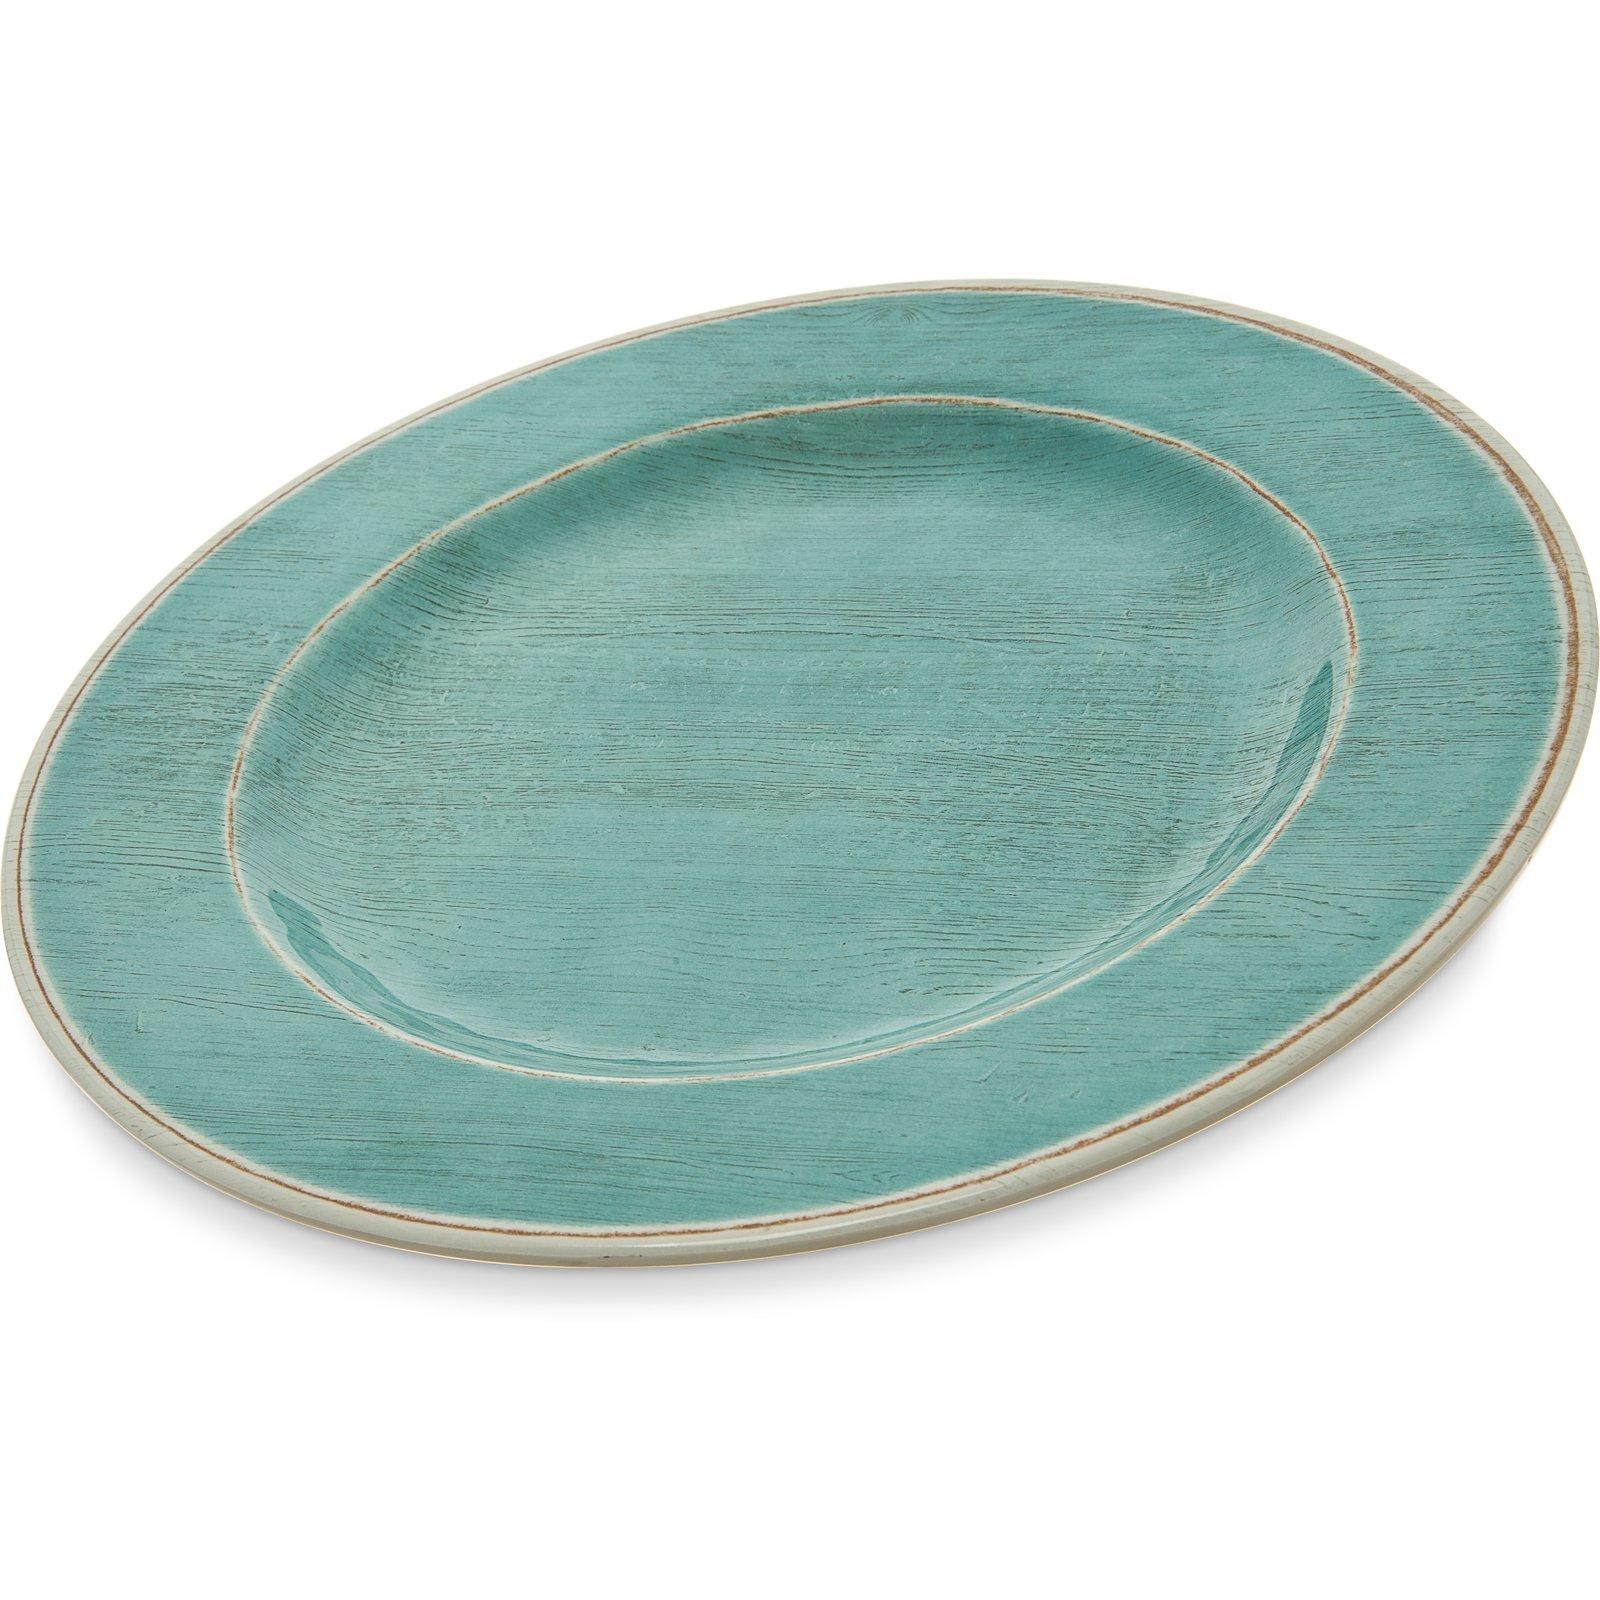 6400115 - Grove Melamine Dinner Plate 11  - Aqua  sc 1 st  Carlisle FoodService Products & 6400115 - Grove Melamine Dinner Plate 11